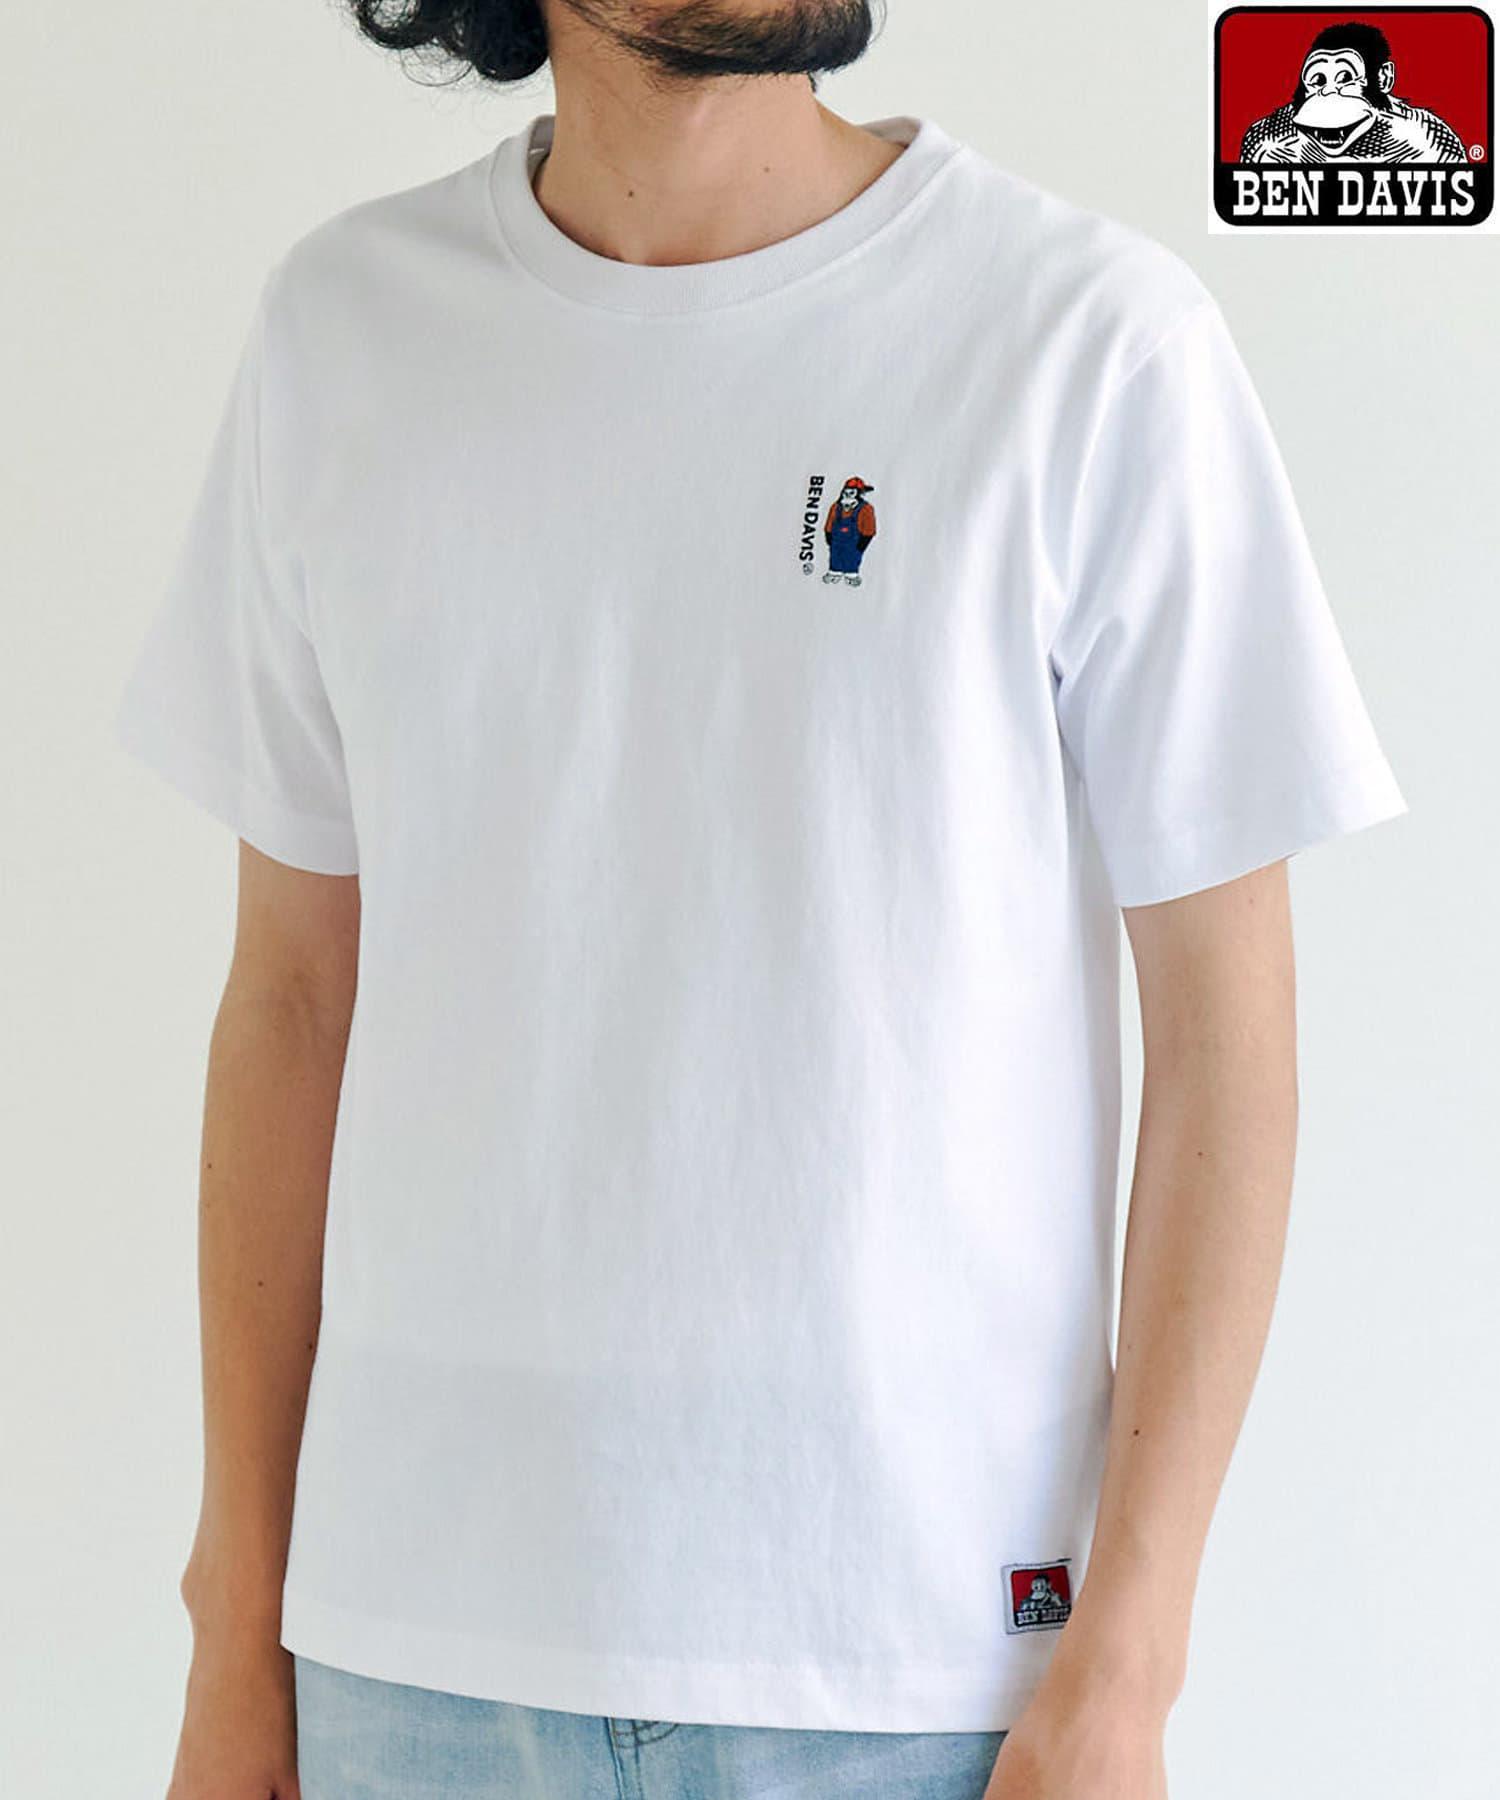 CPCM(シーピーシーエム) 【BEN DAVIS】ミニゴリTシャツ【オンラインストア限定商品】